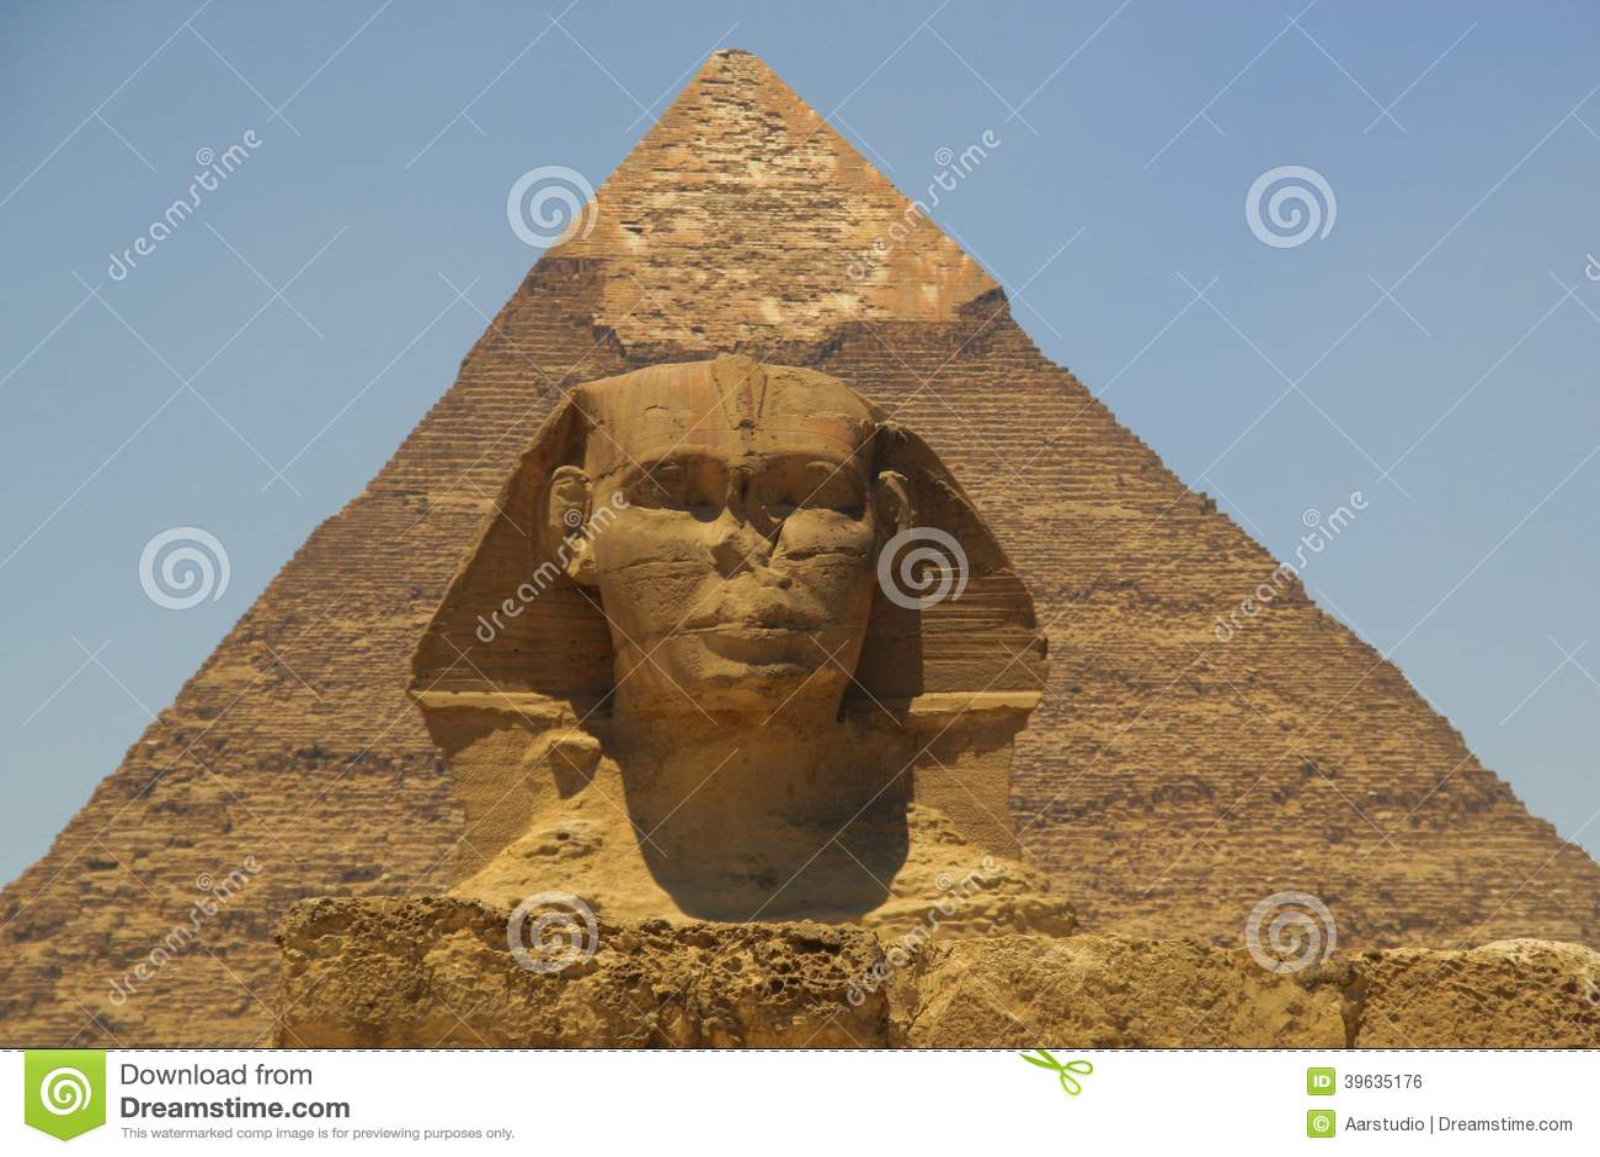 Piramide van Khafre (Chepren) en de Sfinx in Giza - Kaïro - Egypte